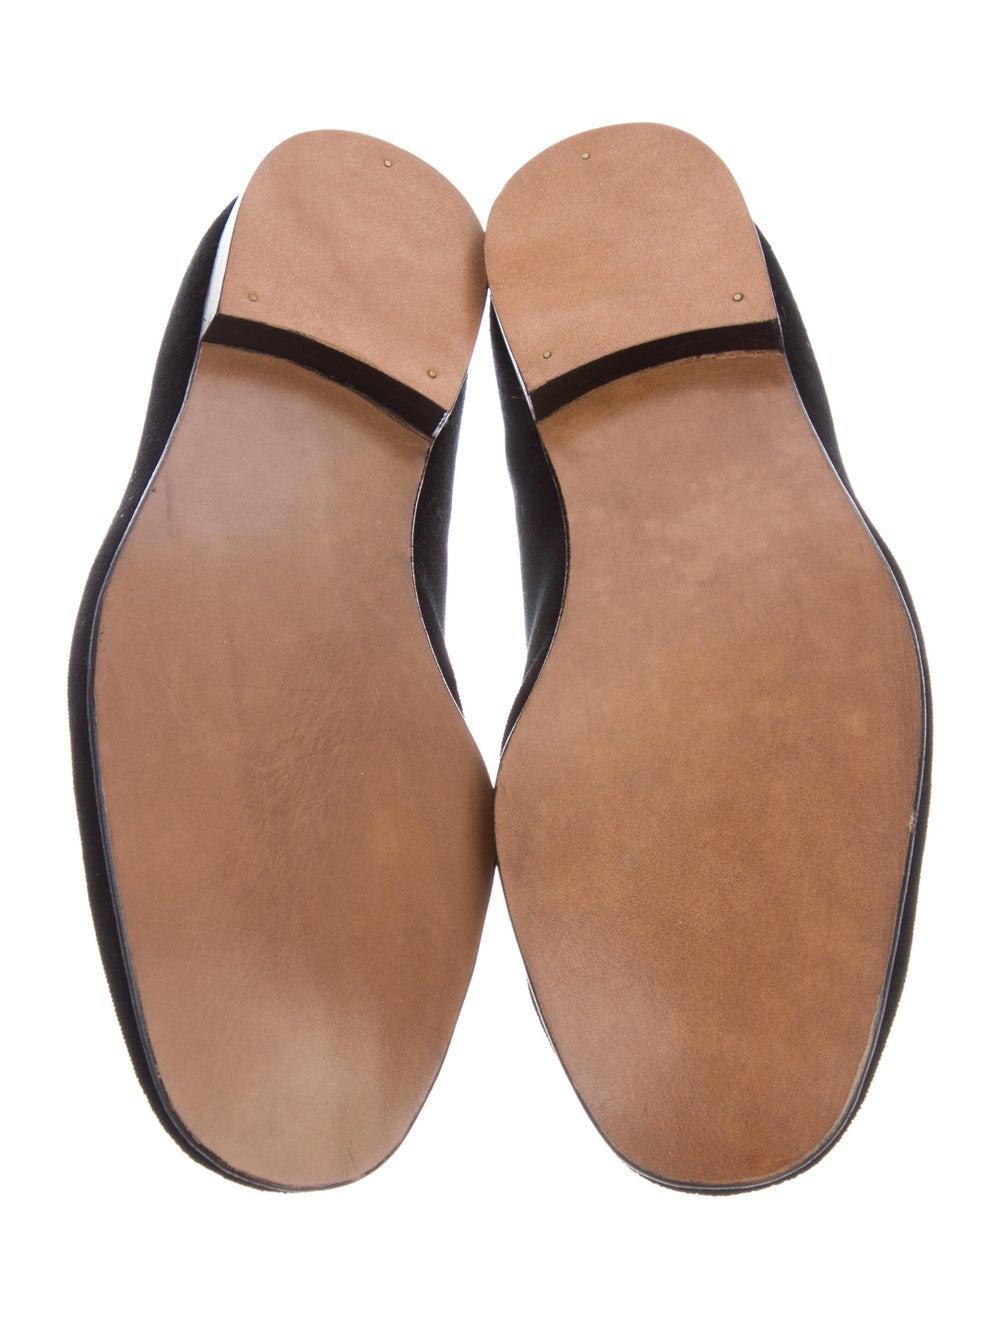 Church's Slippers Black - image 5